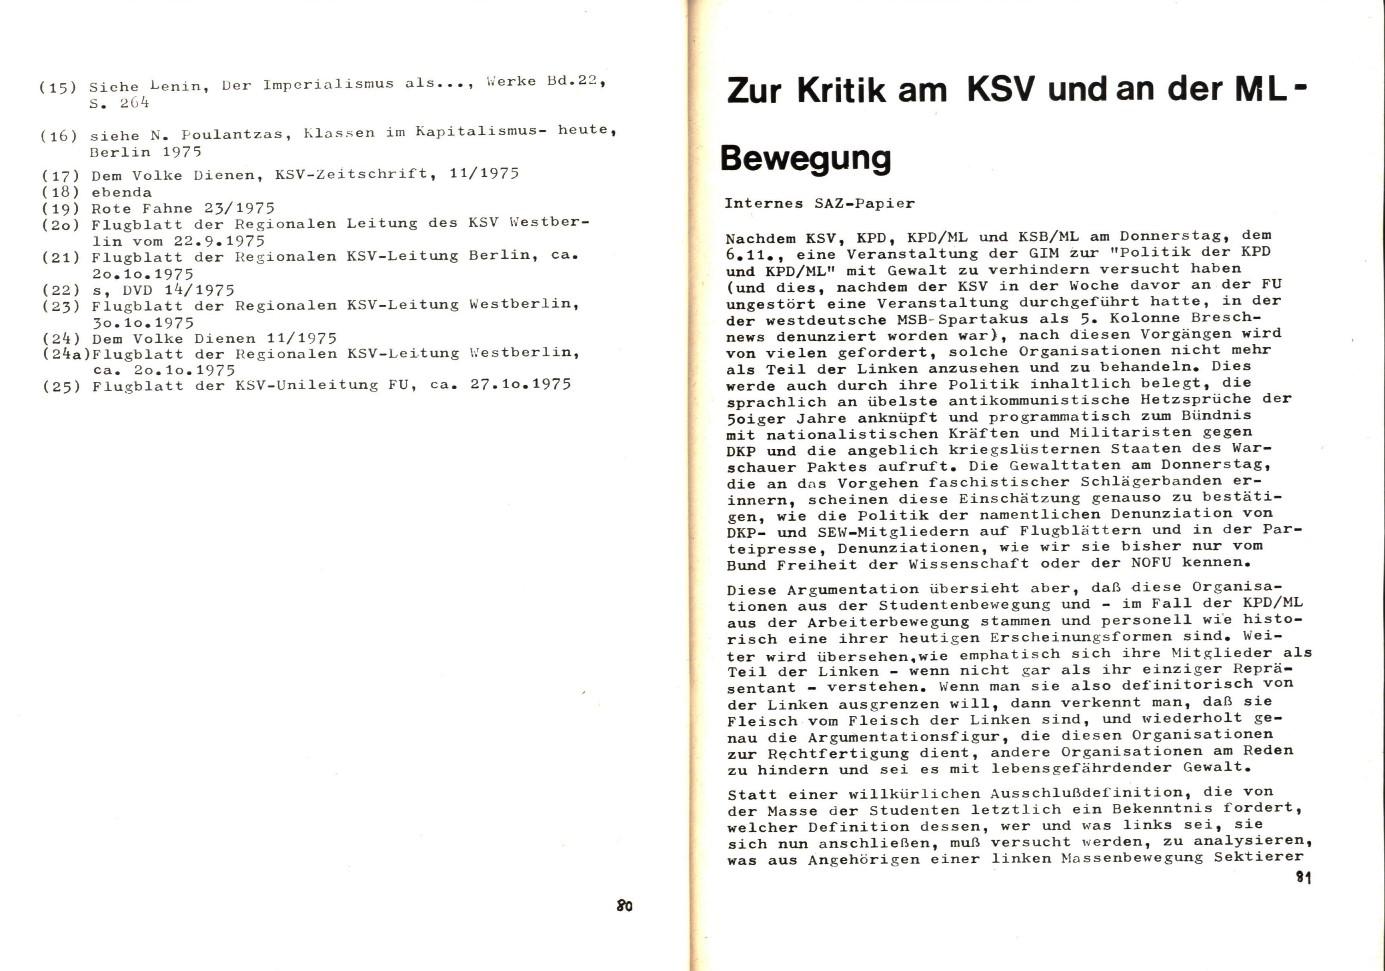 Berlin_KSV_1975_Dokumente_der_SAZ_42